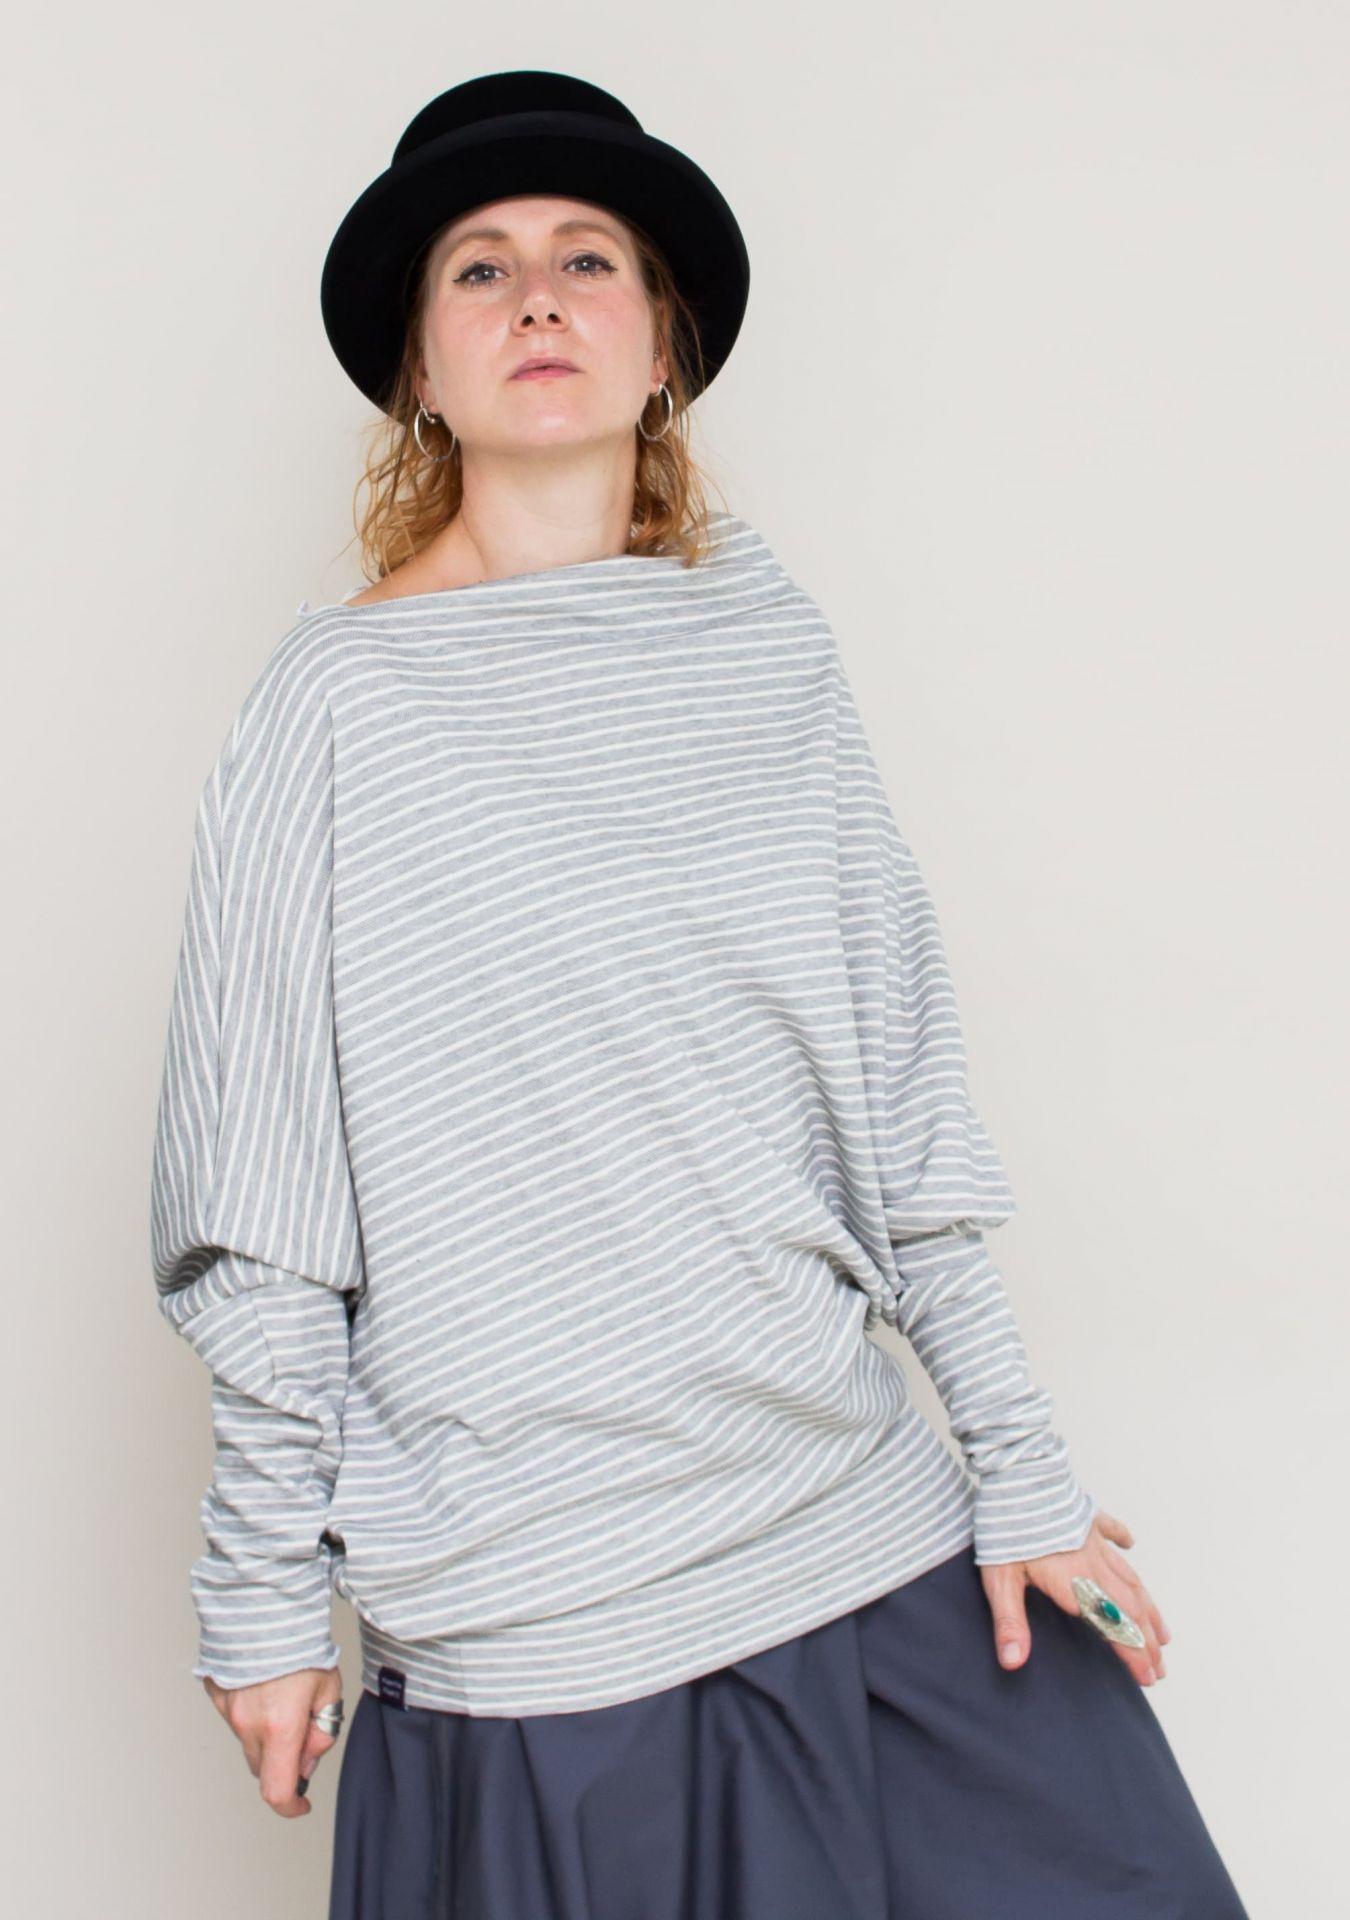 Meda Oversized Pulloverkleid  Doppelgröße Onesize Sl